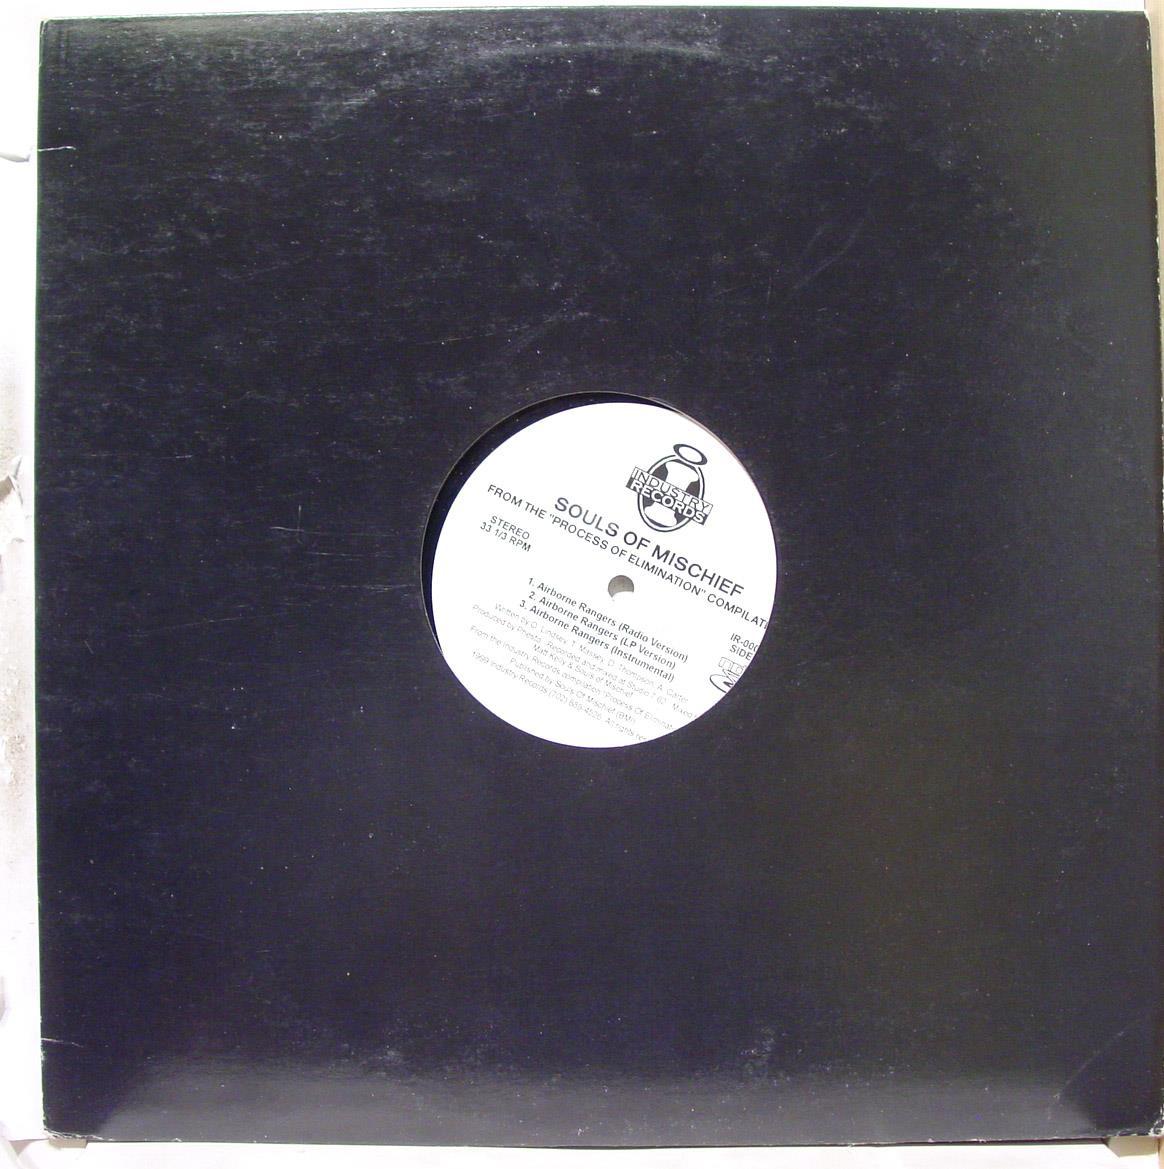 "SOULS OF MISCHIEF - Souls Of Mischief Airborne Rangers 12"" Vg+ Ir 00051 Vinyl 1999 Record (airborne Rangers)"